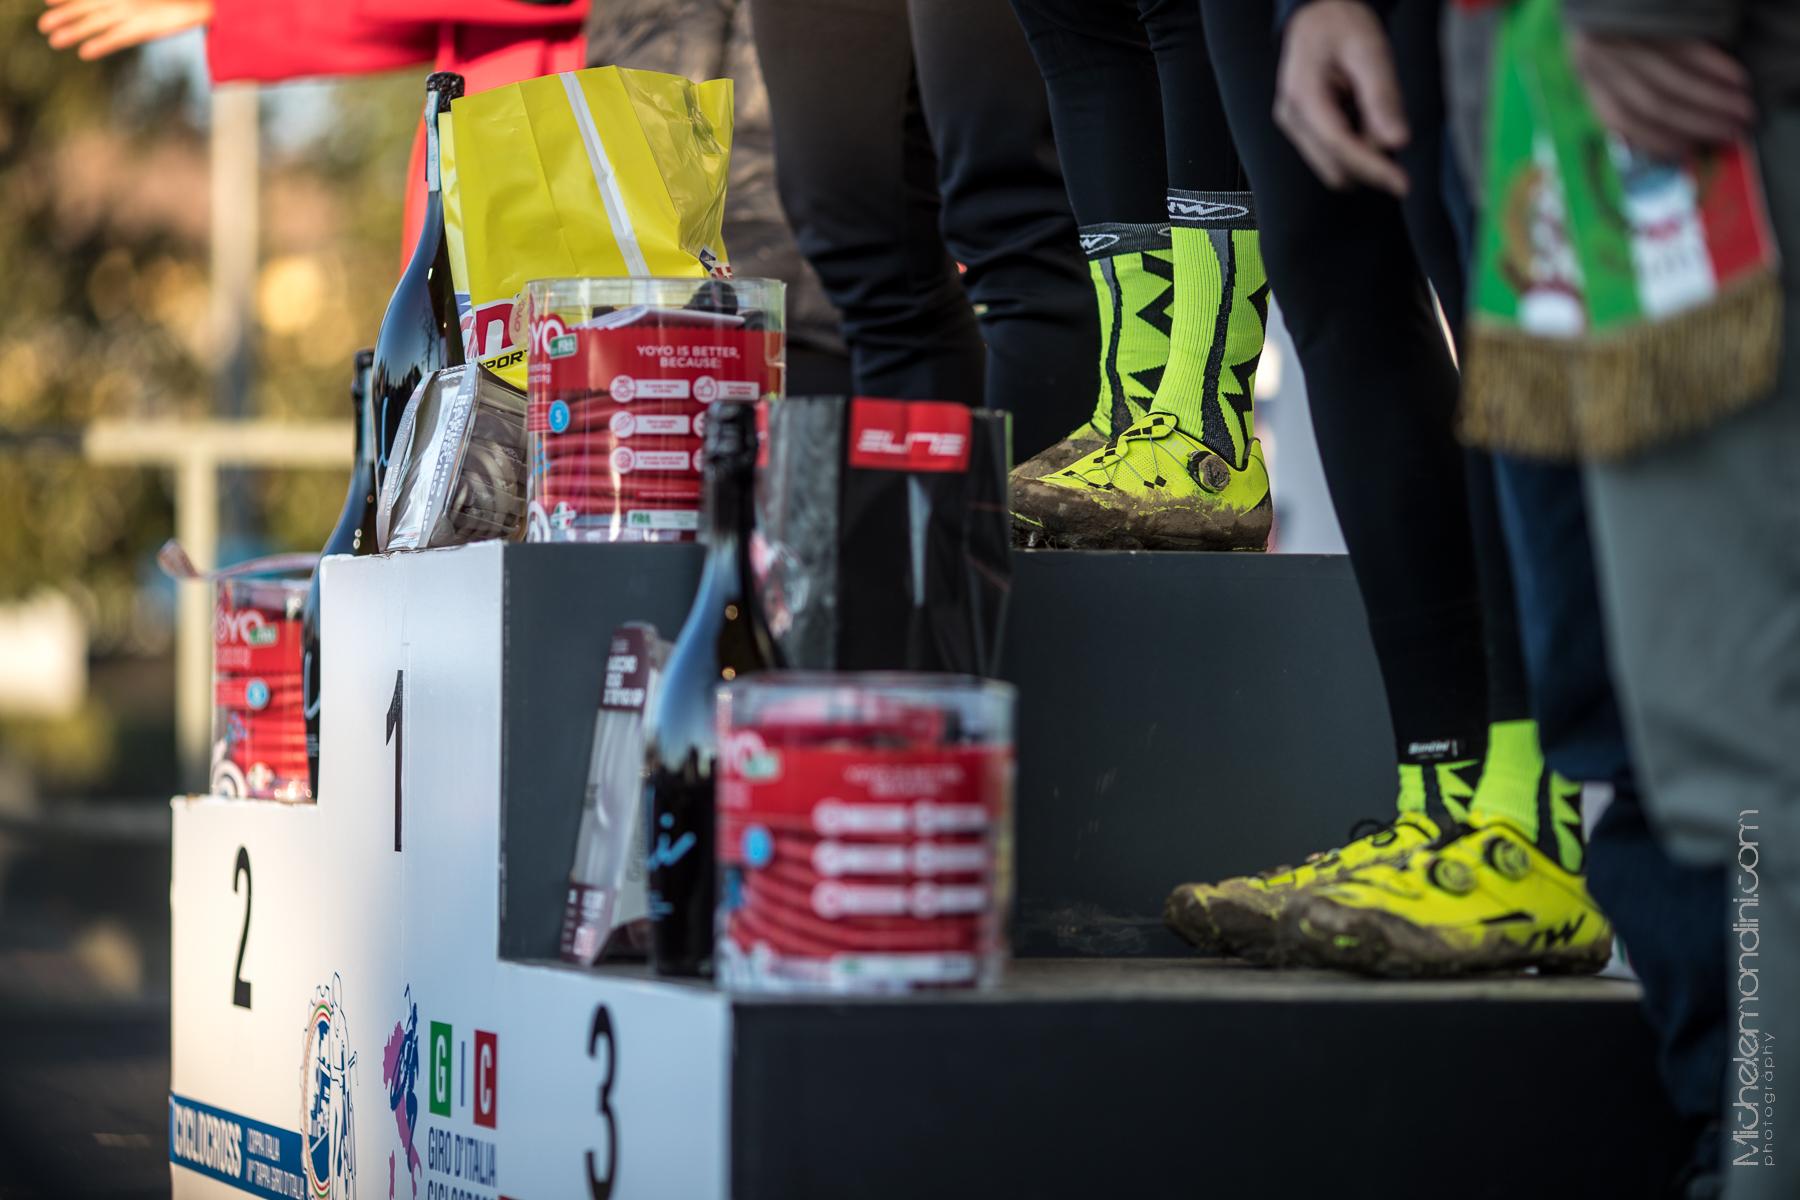 Northwave cyclocross podium in Silvelle. - Ph: Michele Mondini